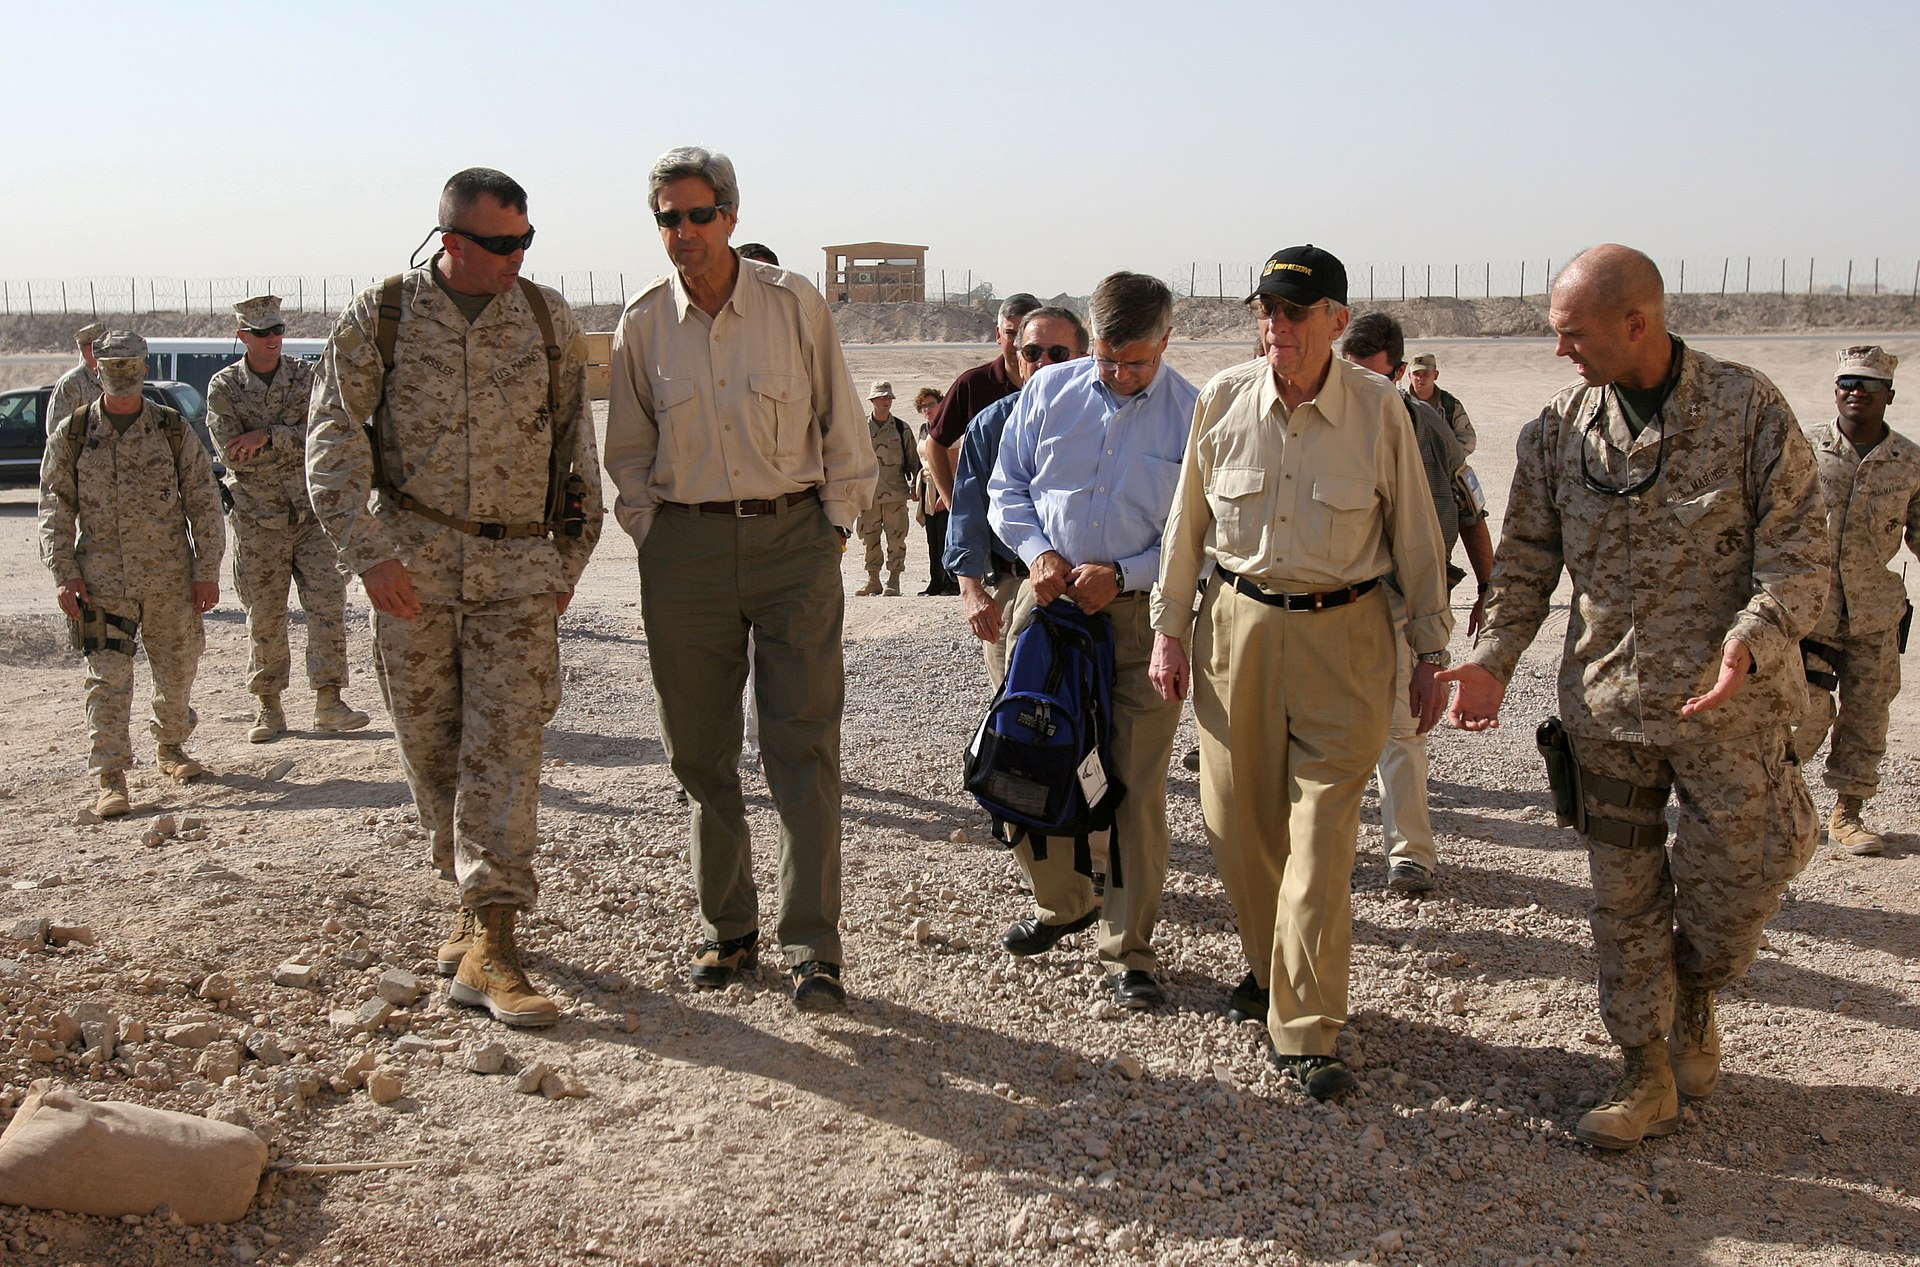 U.S. Senators John Kerry of Massachusetts, Ted Stevens of Alaska, and John Warner of Virginia in Al Taqaddum [ at Habbaniyah] 2007